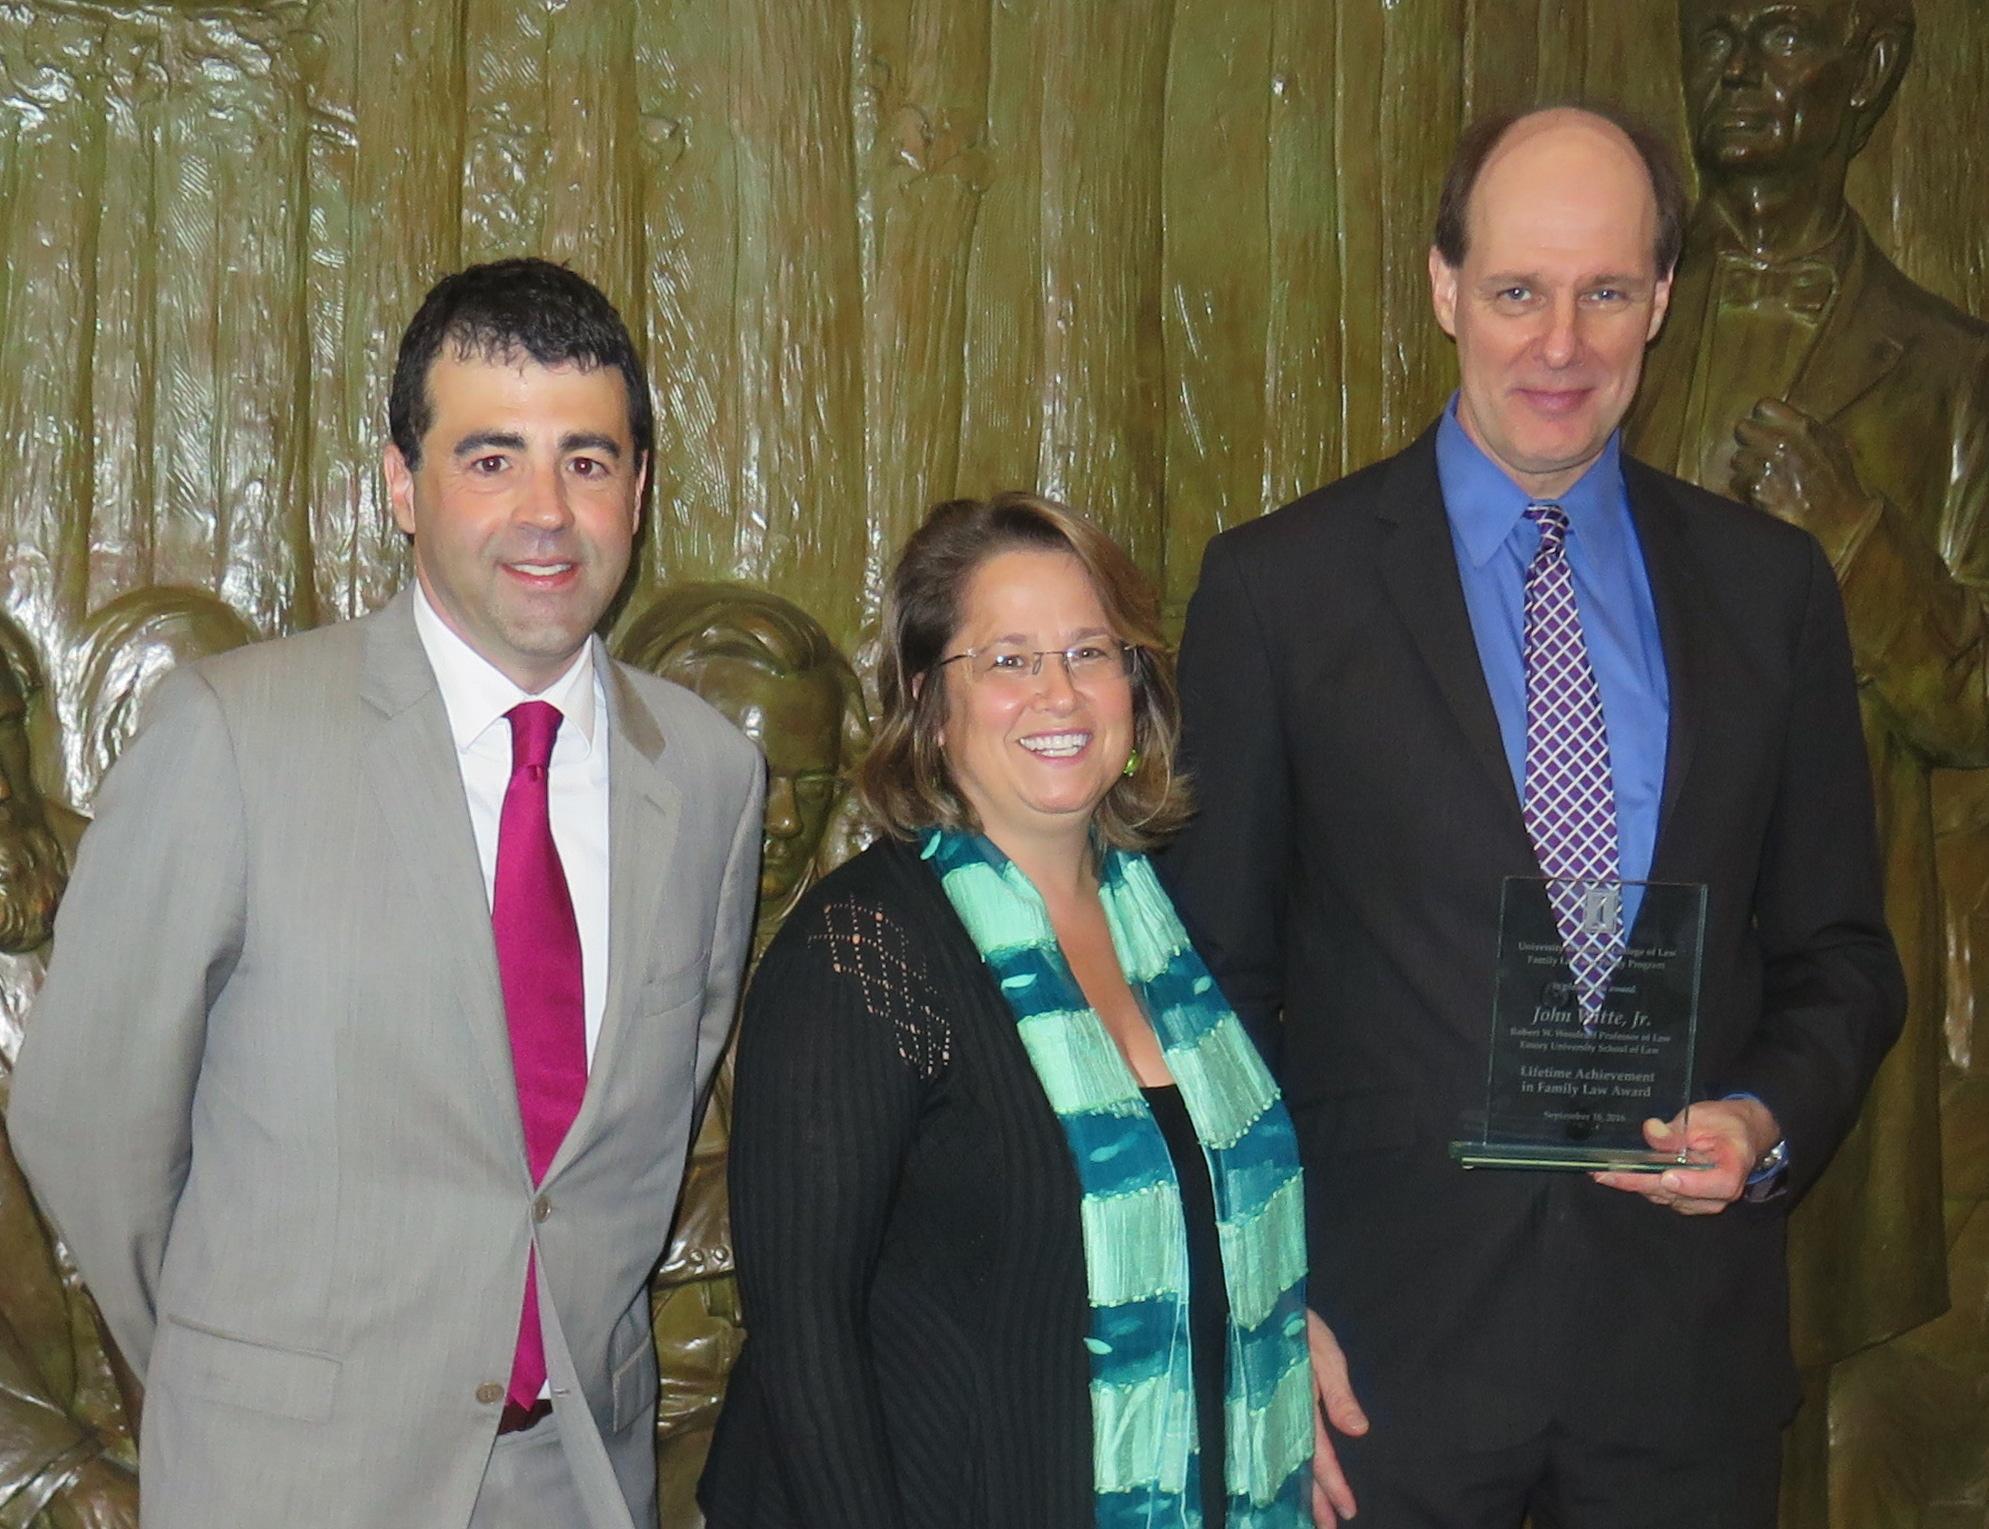 Fam law Witte lifetime achievement receiving award.JPG